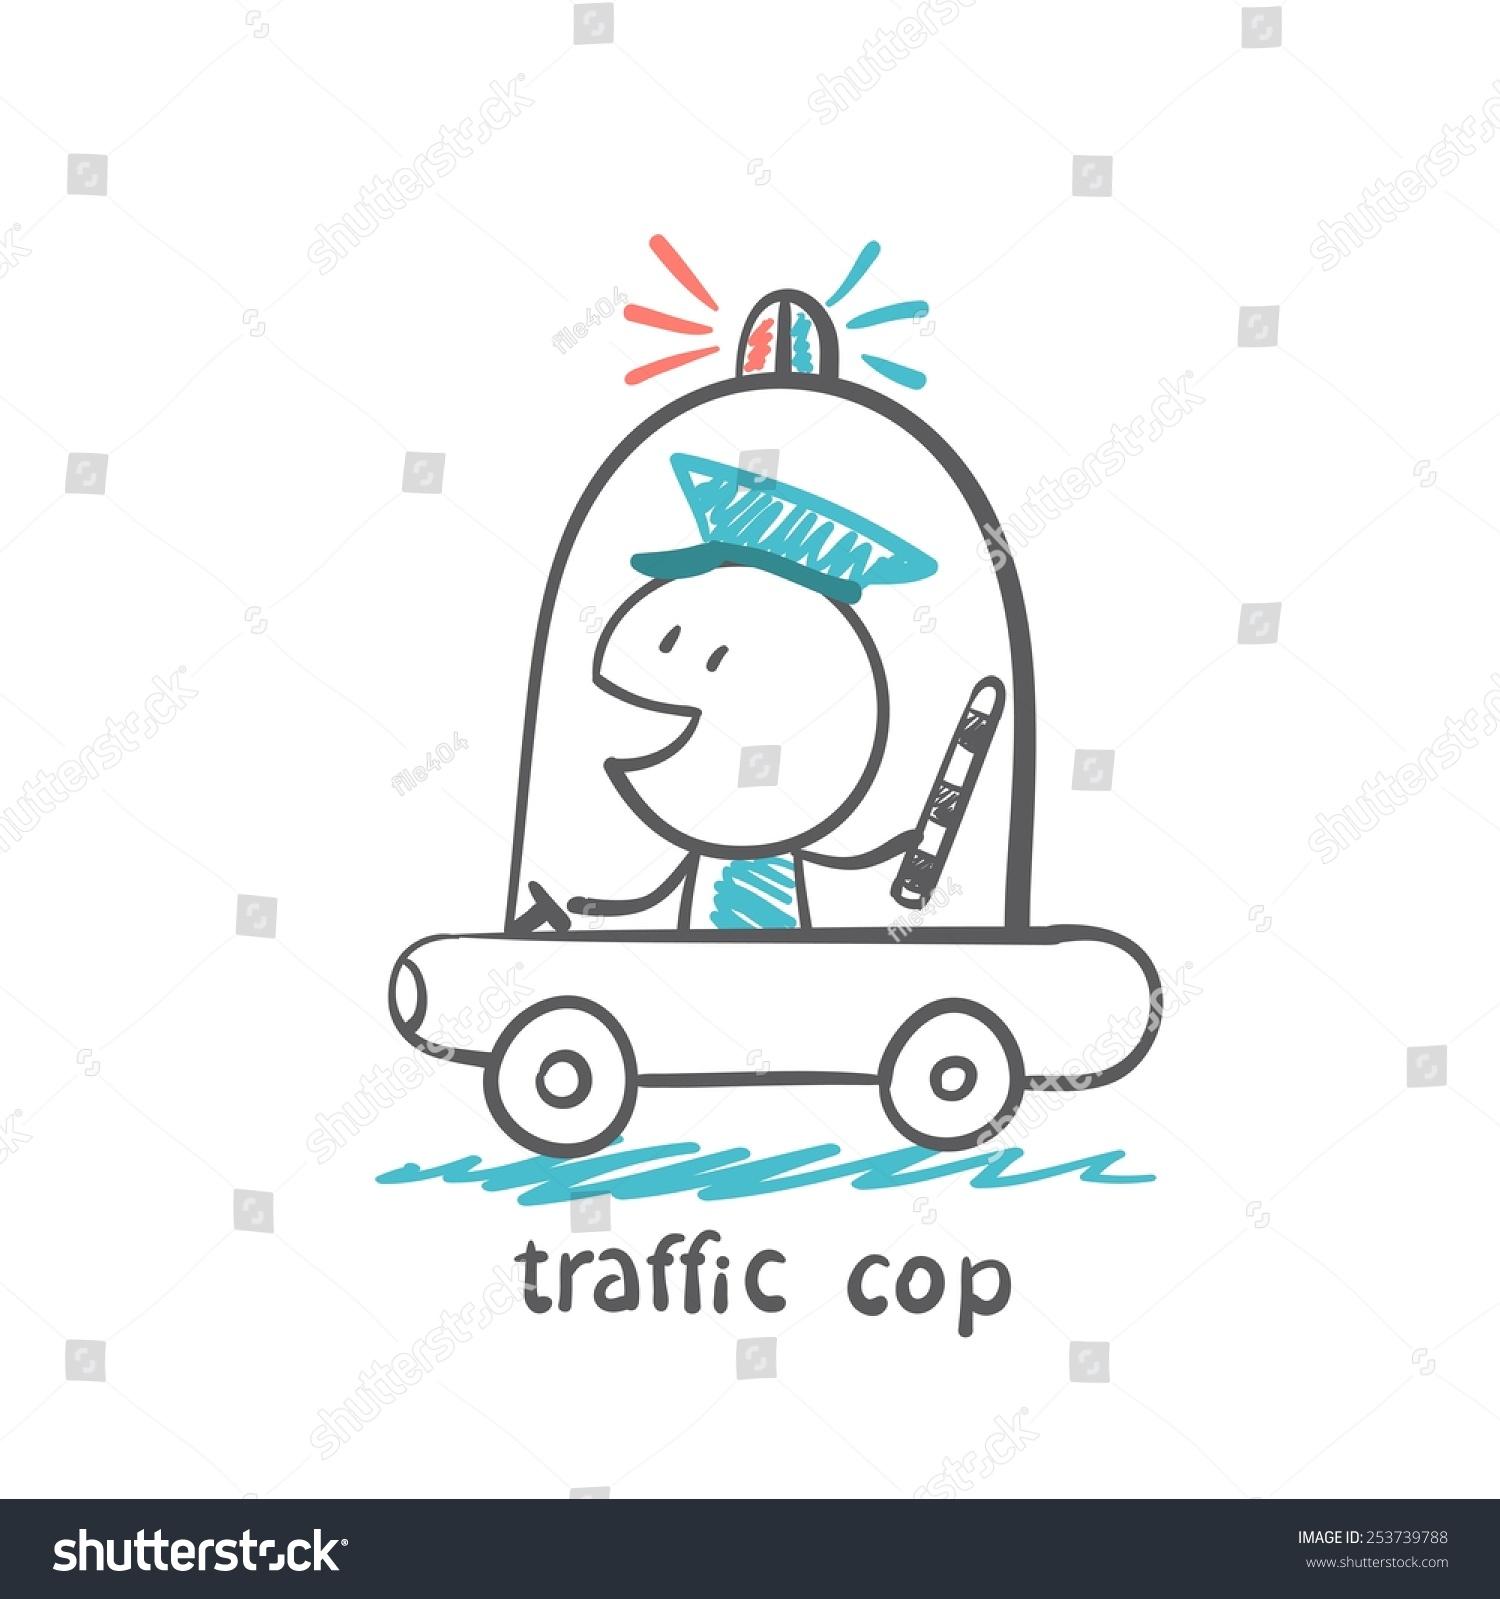 Traffic Cop Police Car Illustrator Stock Vector 253739788 - Shutterstock